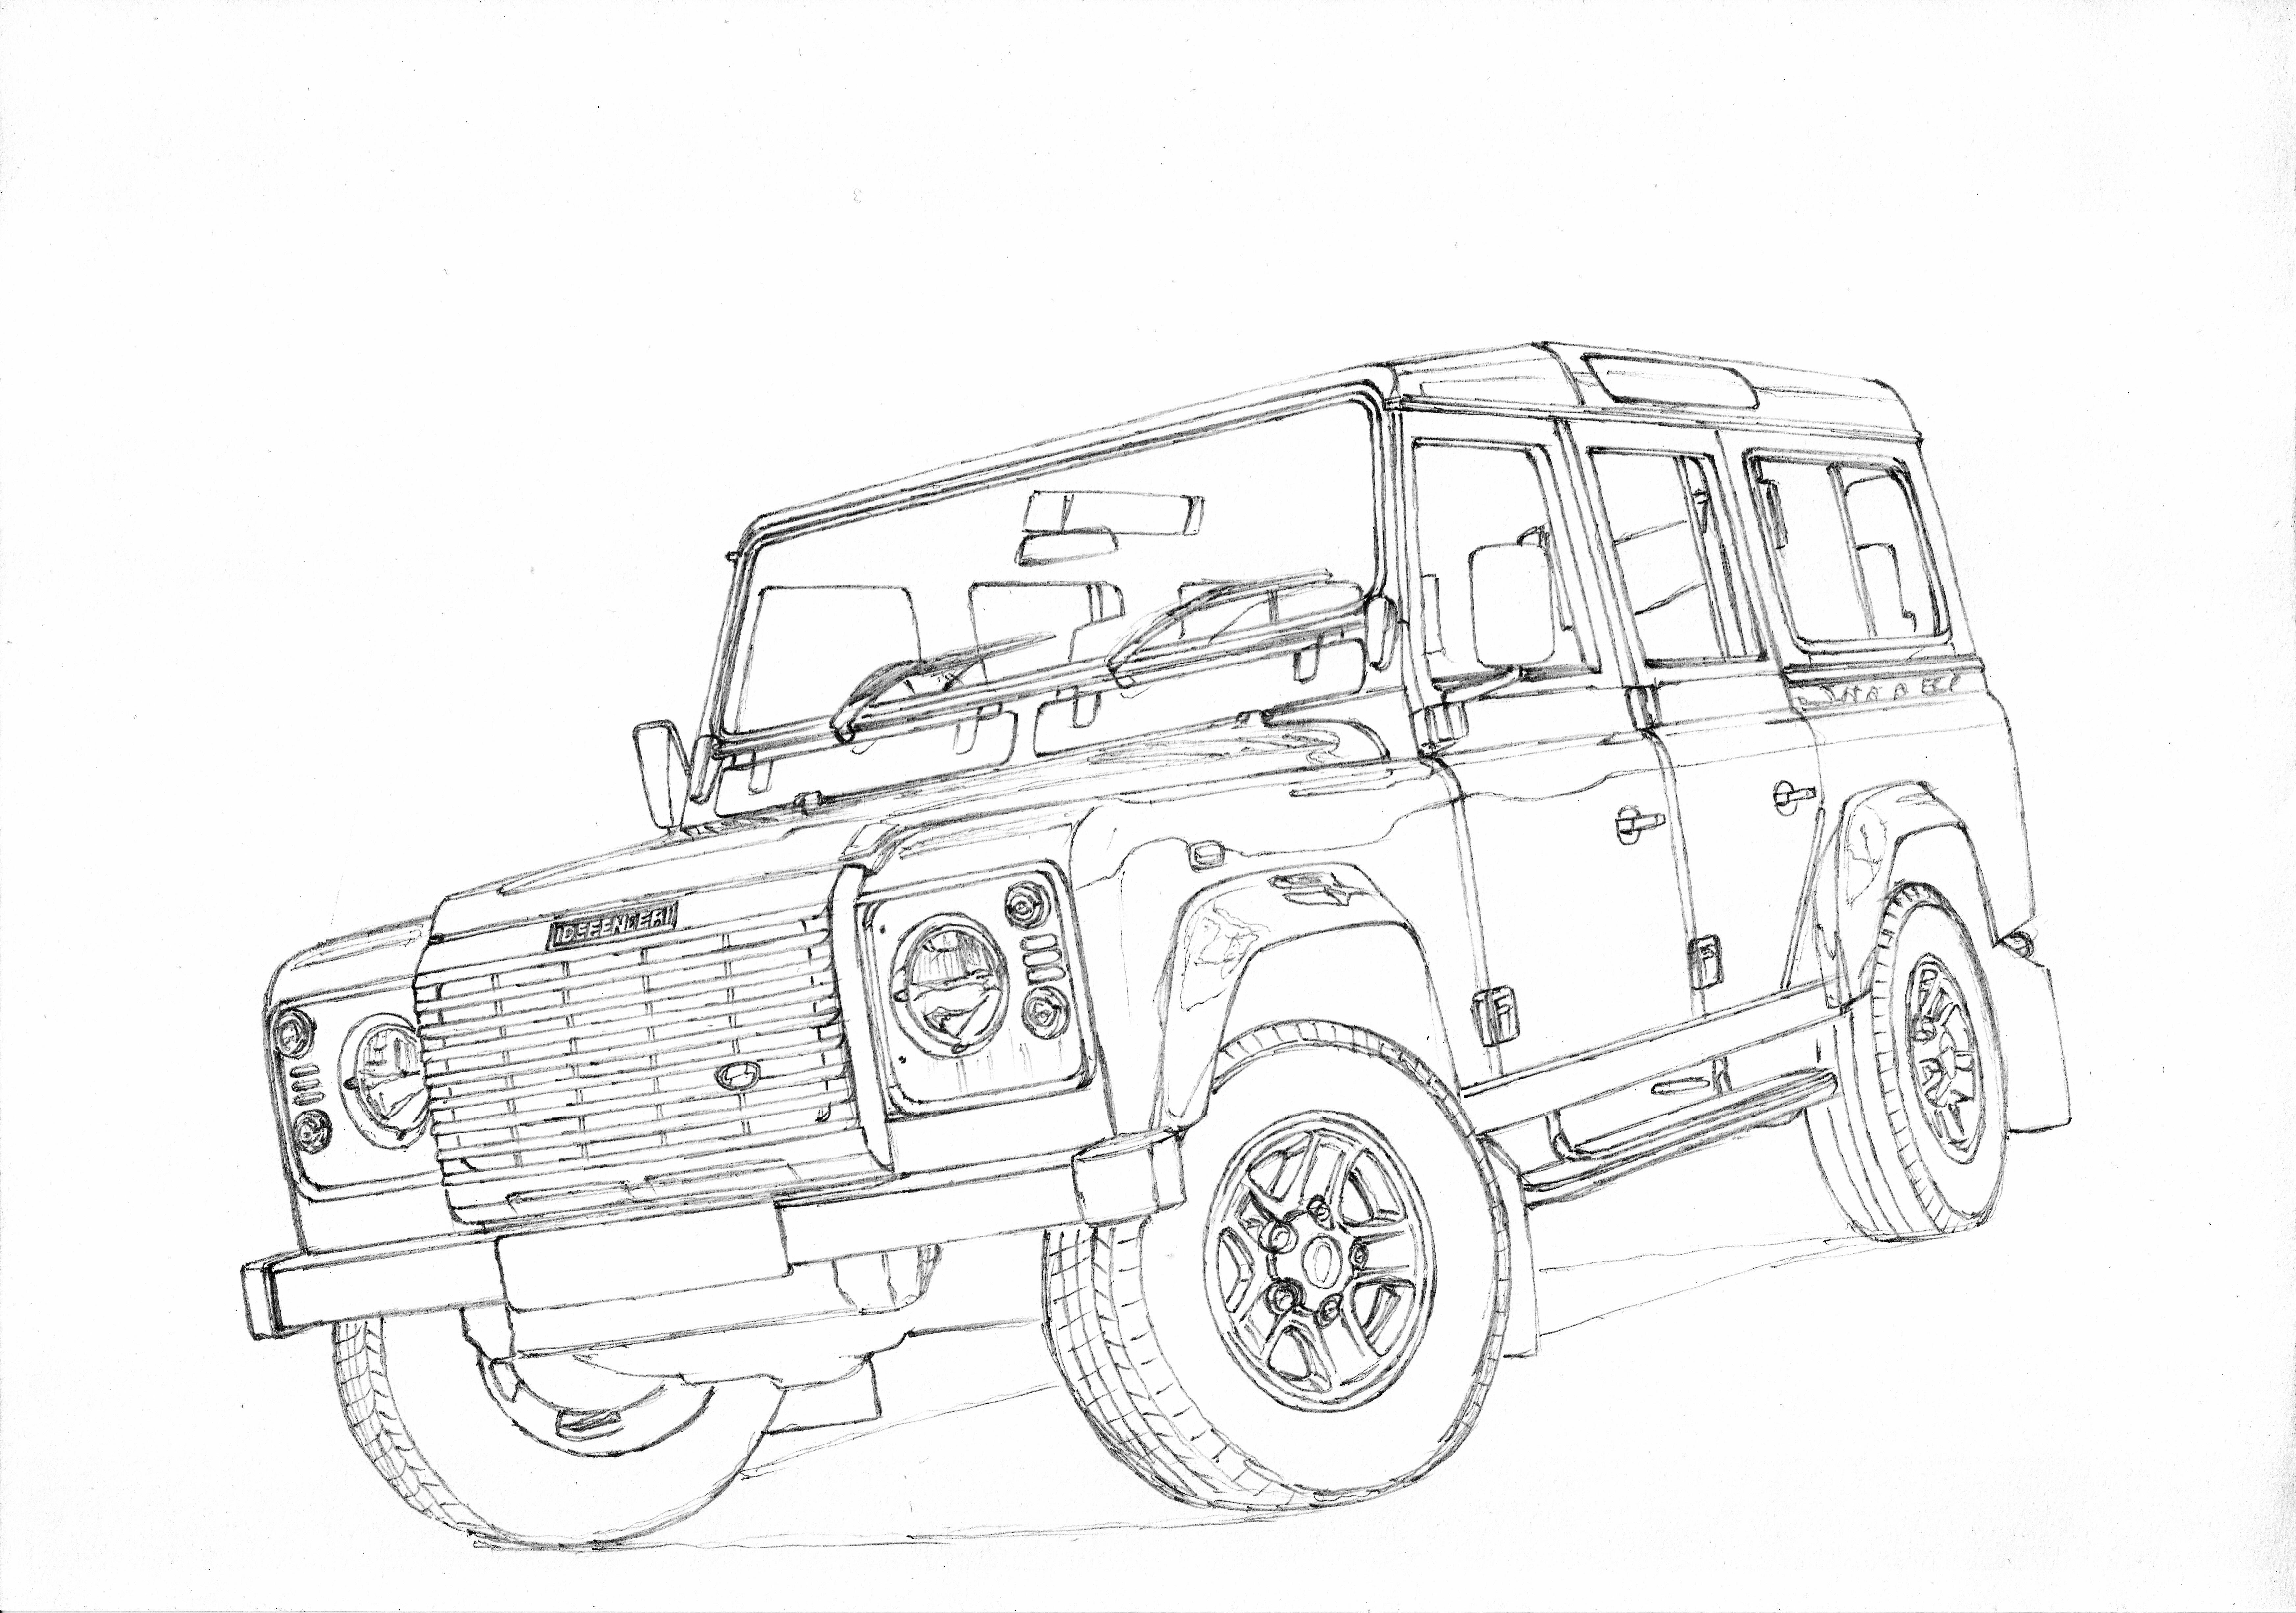 Land Rover Defender 110 1 3 A Sketch Of My Favorite Offroad Car Landrover Defender Britain England Land Rover Defender Land Rover Defender 110 Land Rover